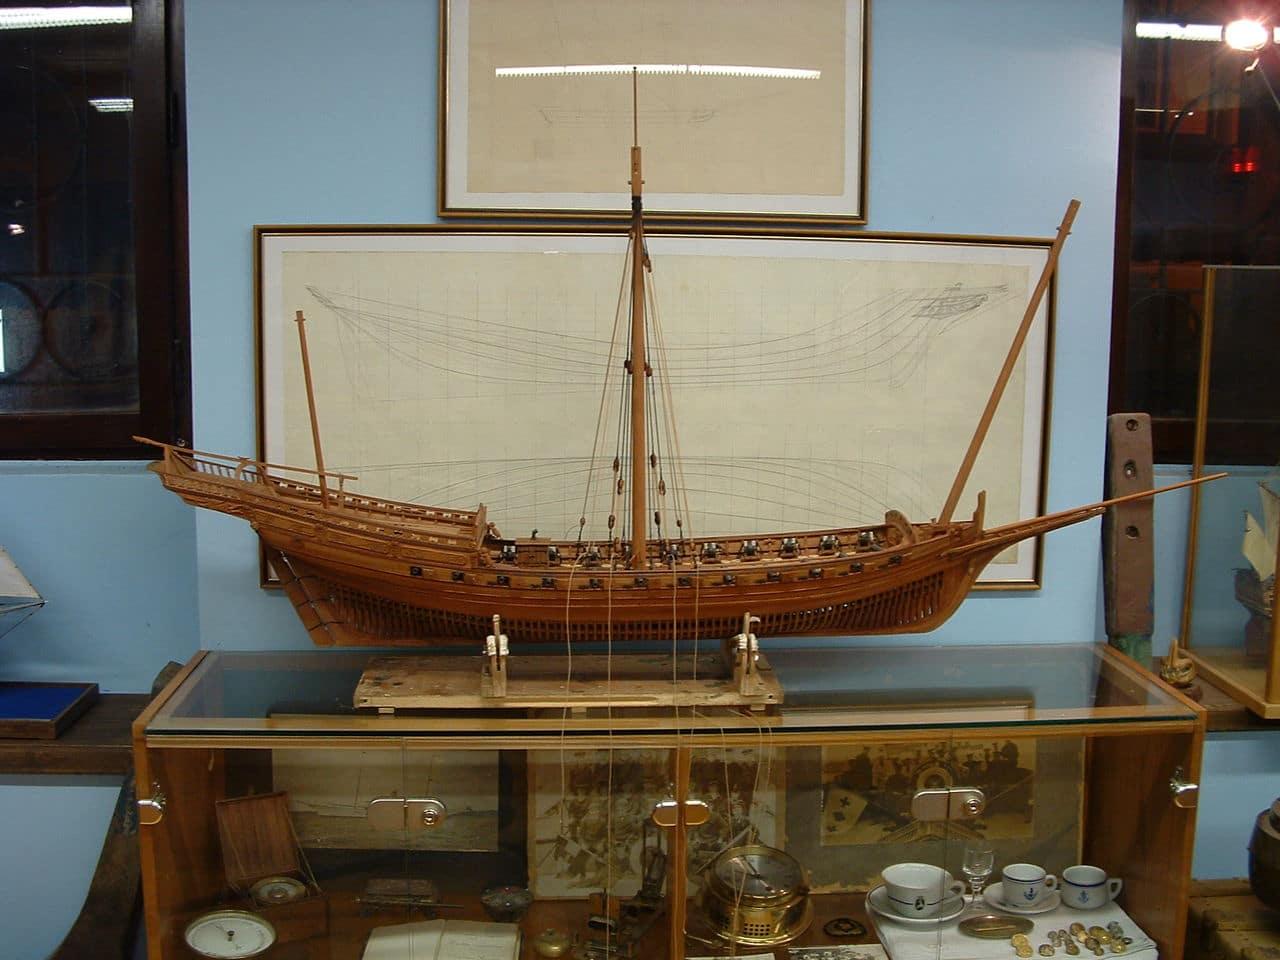 Chebec Le Requin - 1750 1207